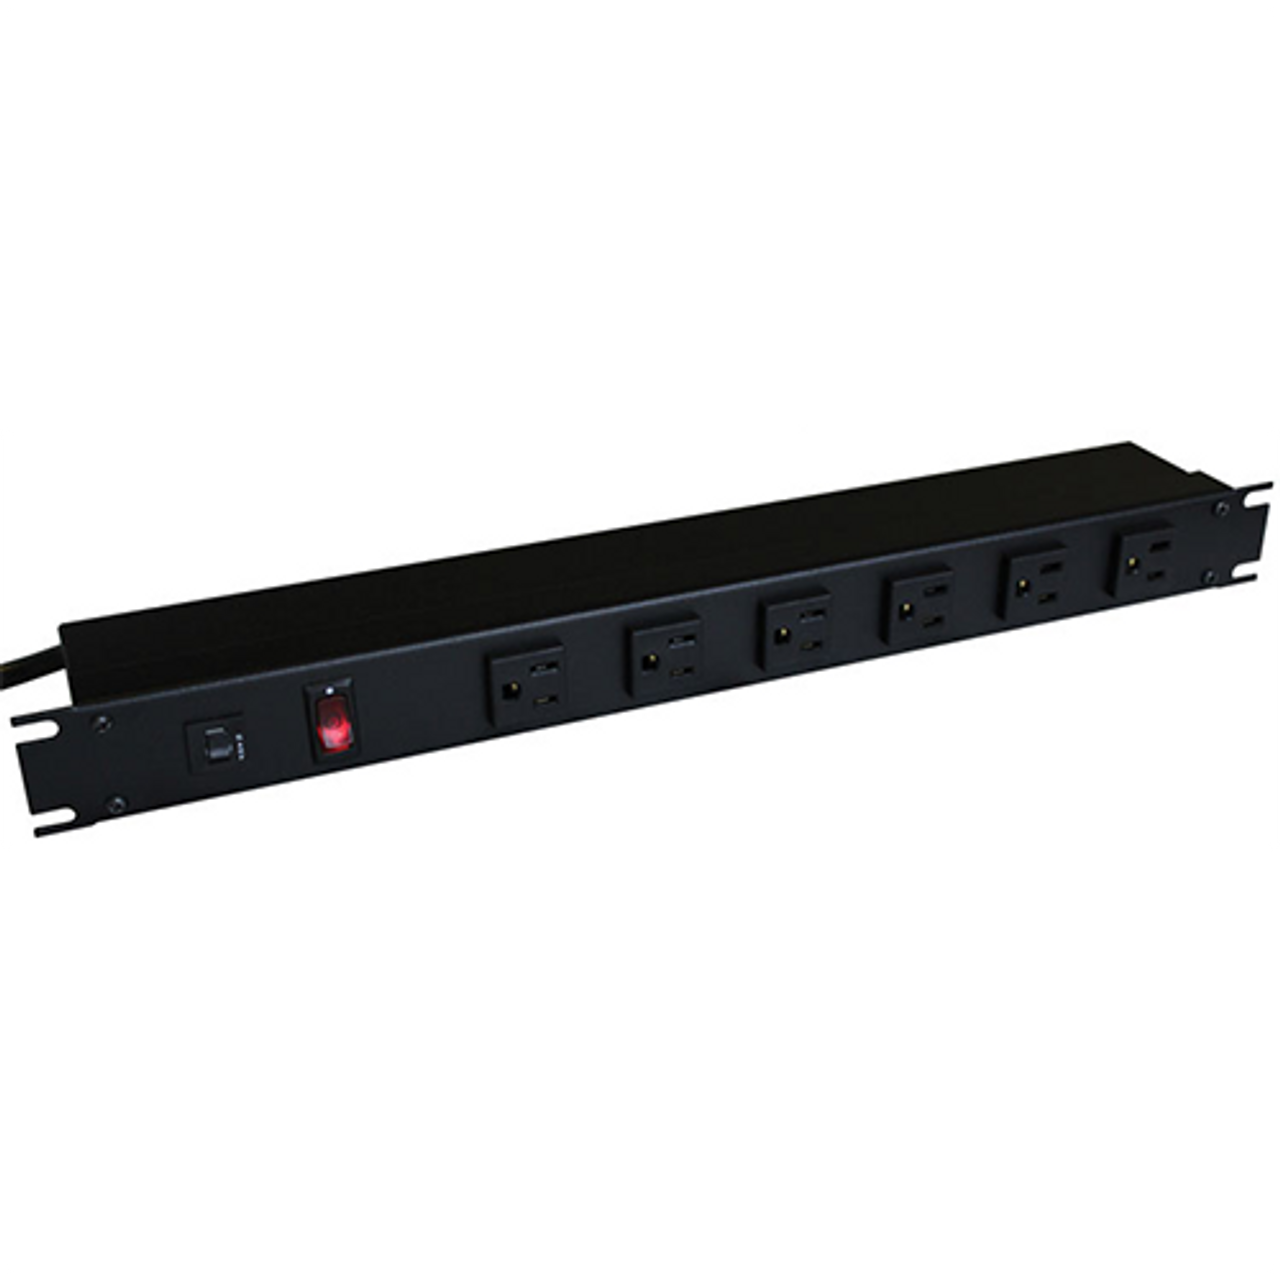 Industrial rack mount power strip delicia!!!